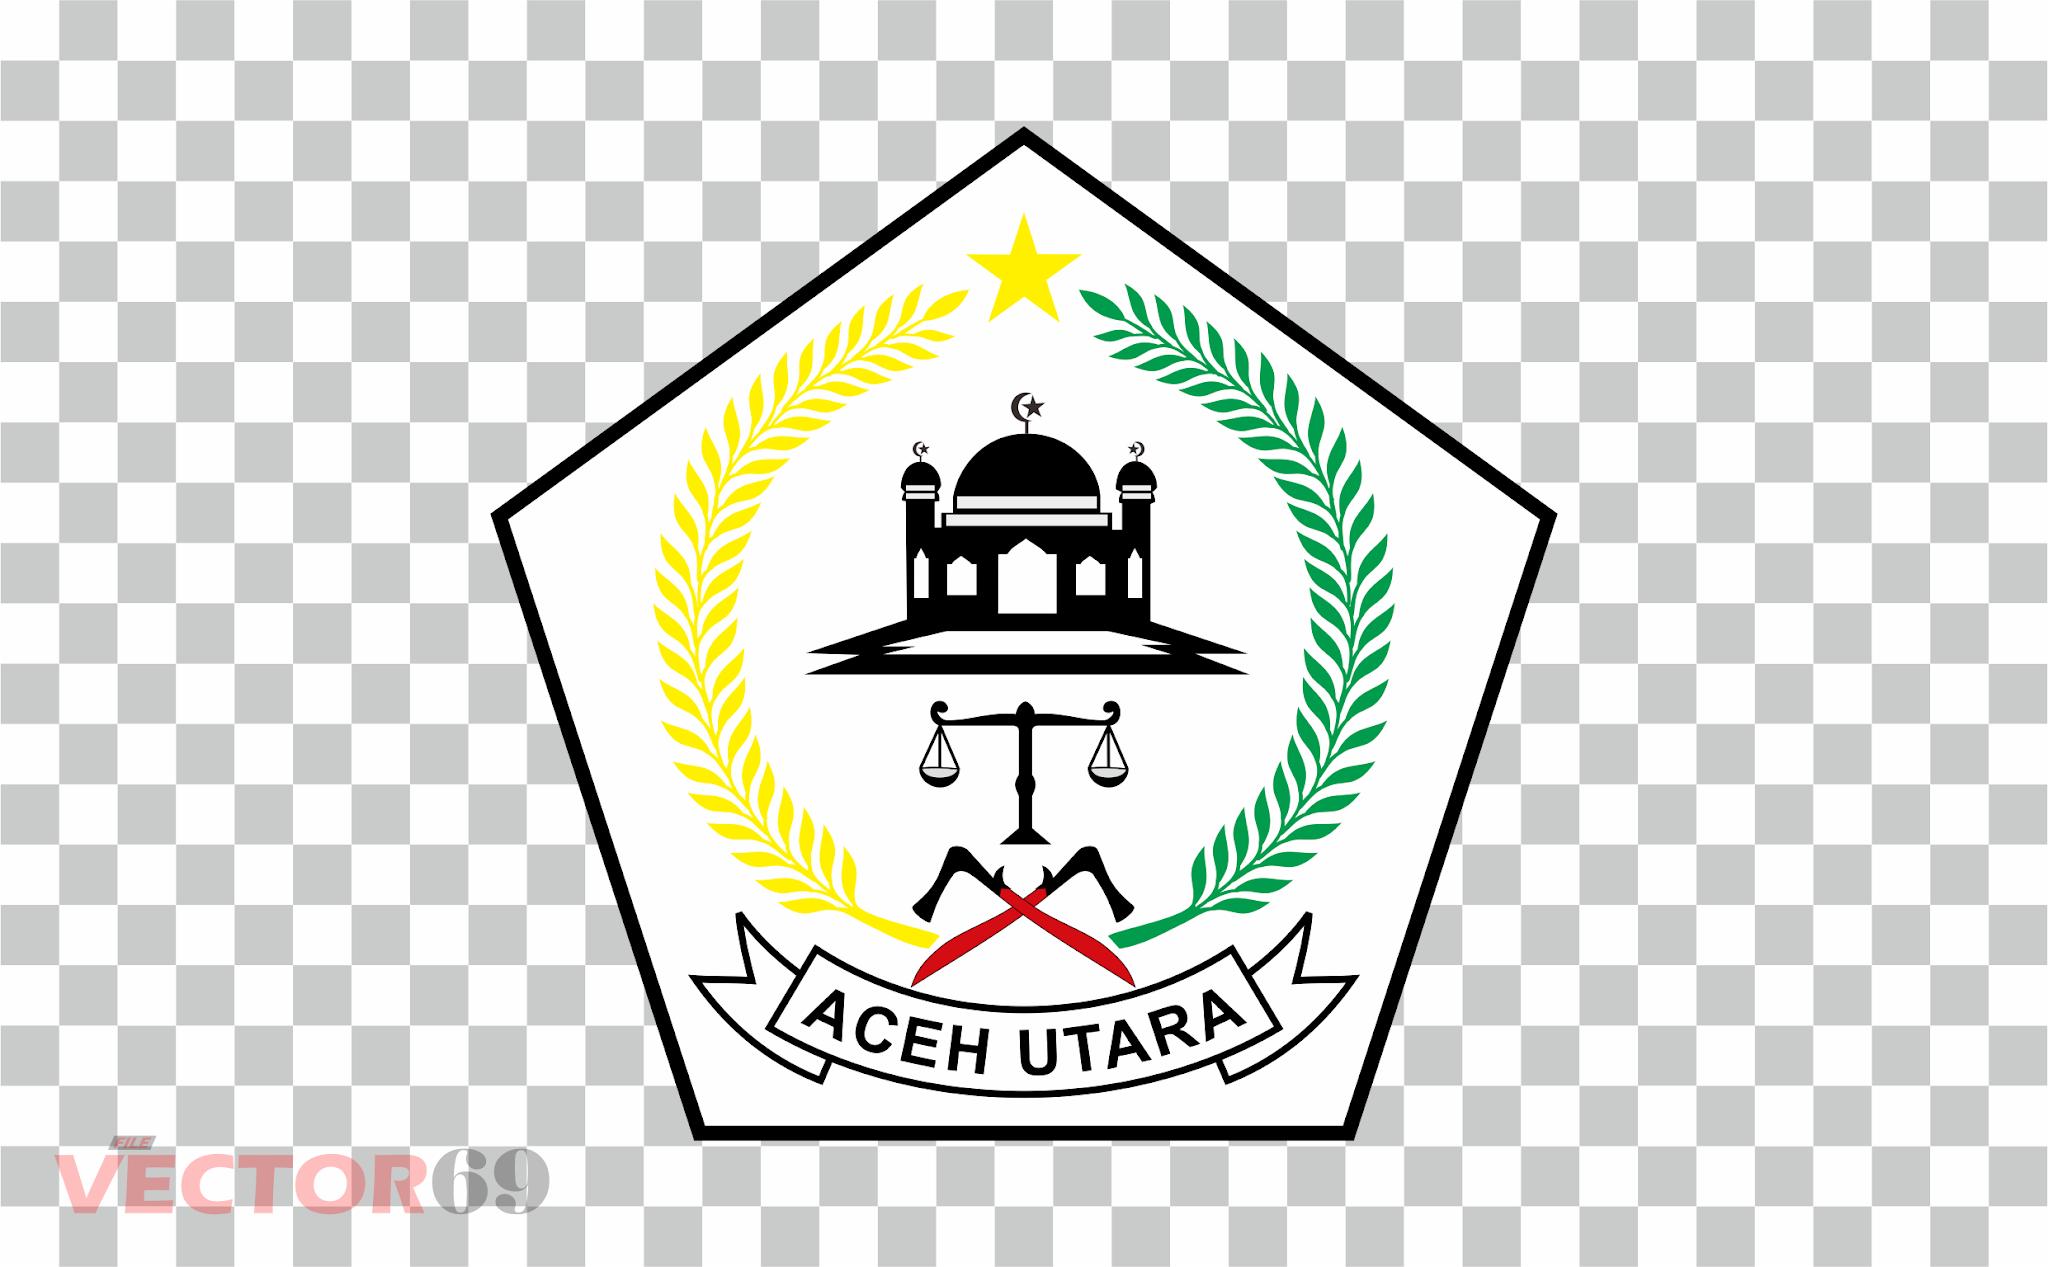 Kabupaten Aceh Utara Logo - Download Vector File PNG (Portable Network Graphics)